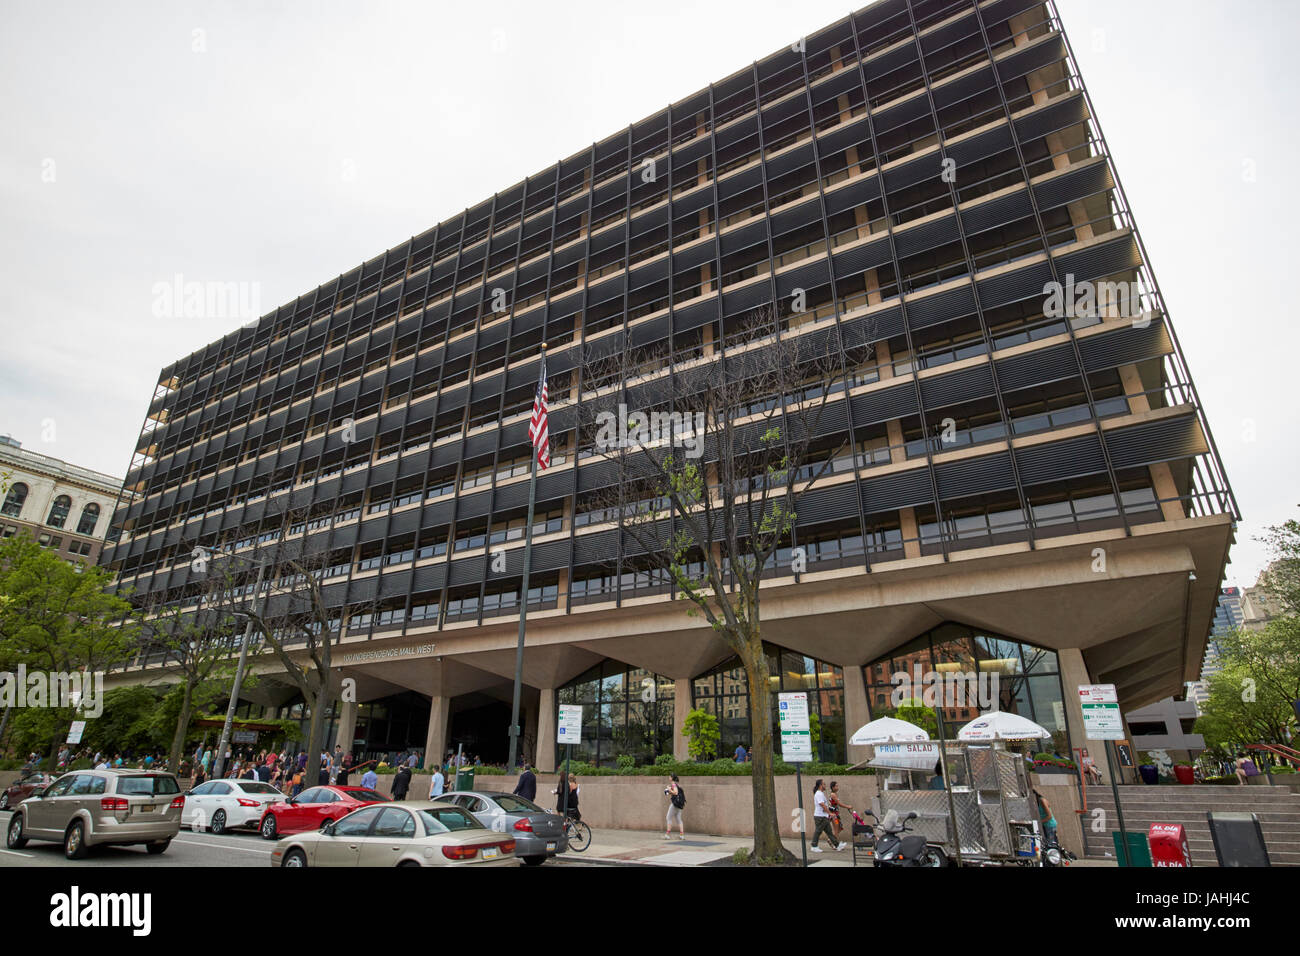 rohm and haas corporate headquarters office building Philadelphia USA - Stock Image